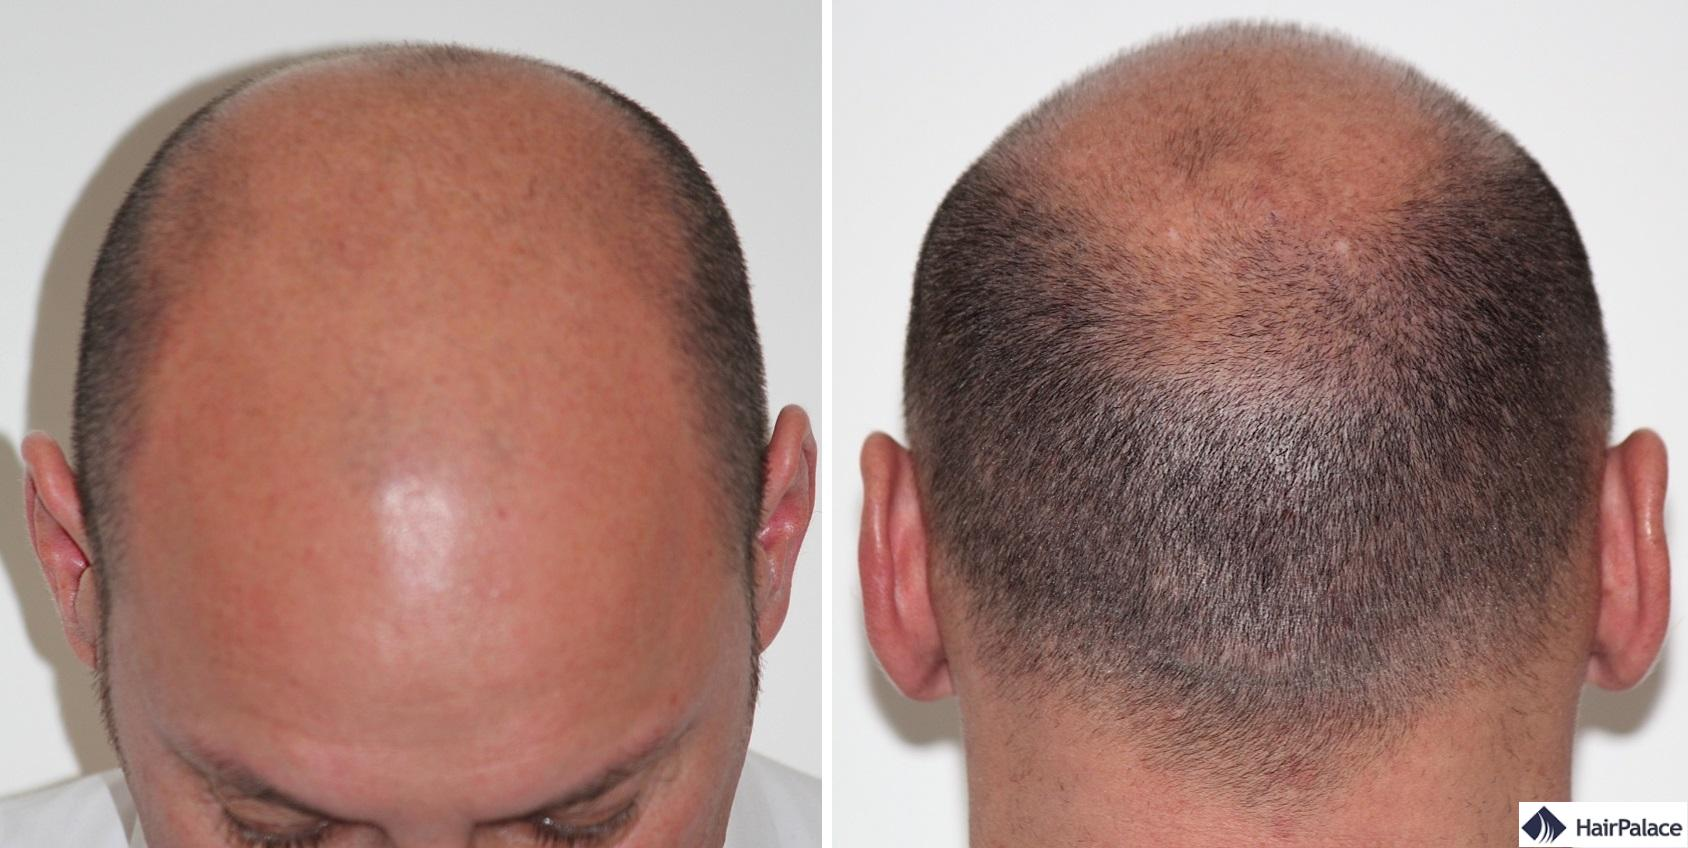 xavier-vor-der-haartransplantation